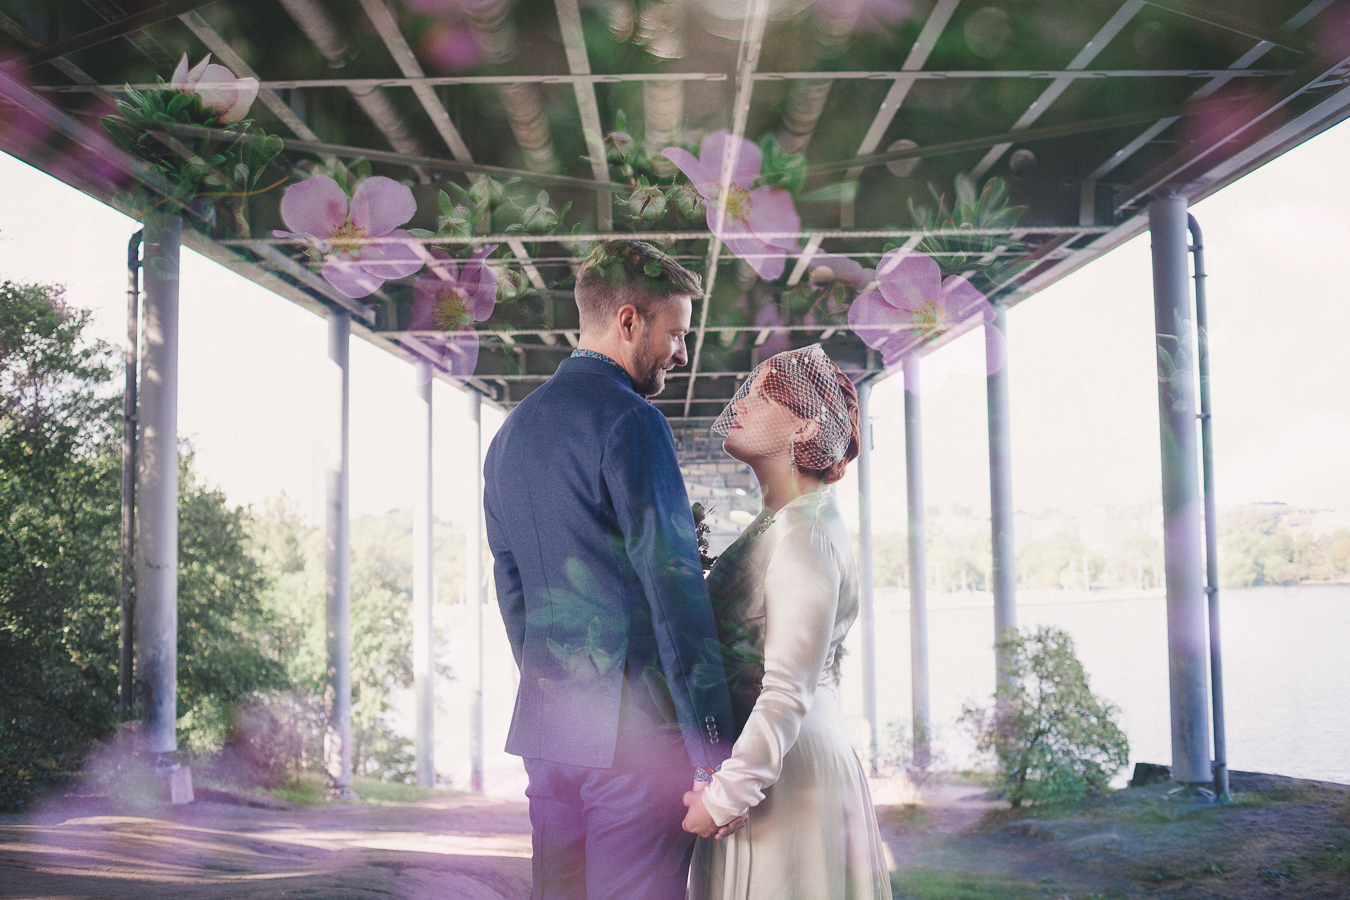 Lisa-Per-Wedding-Photo-Emily-Dahl-Arsenik-fotografi-3